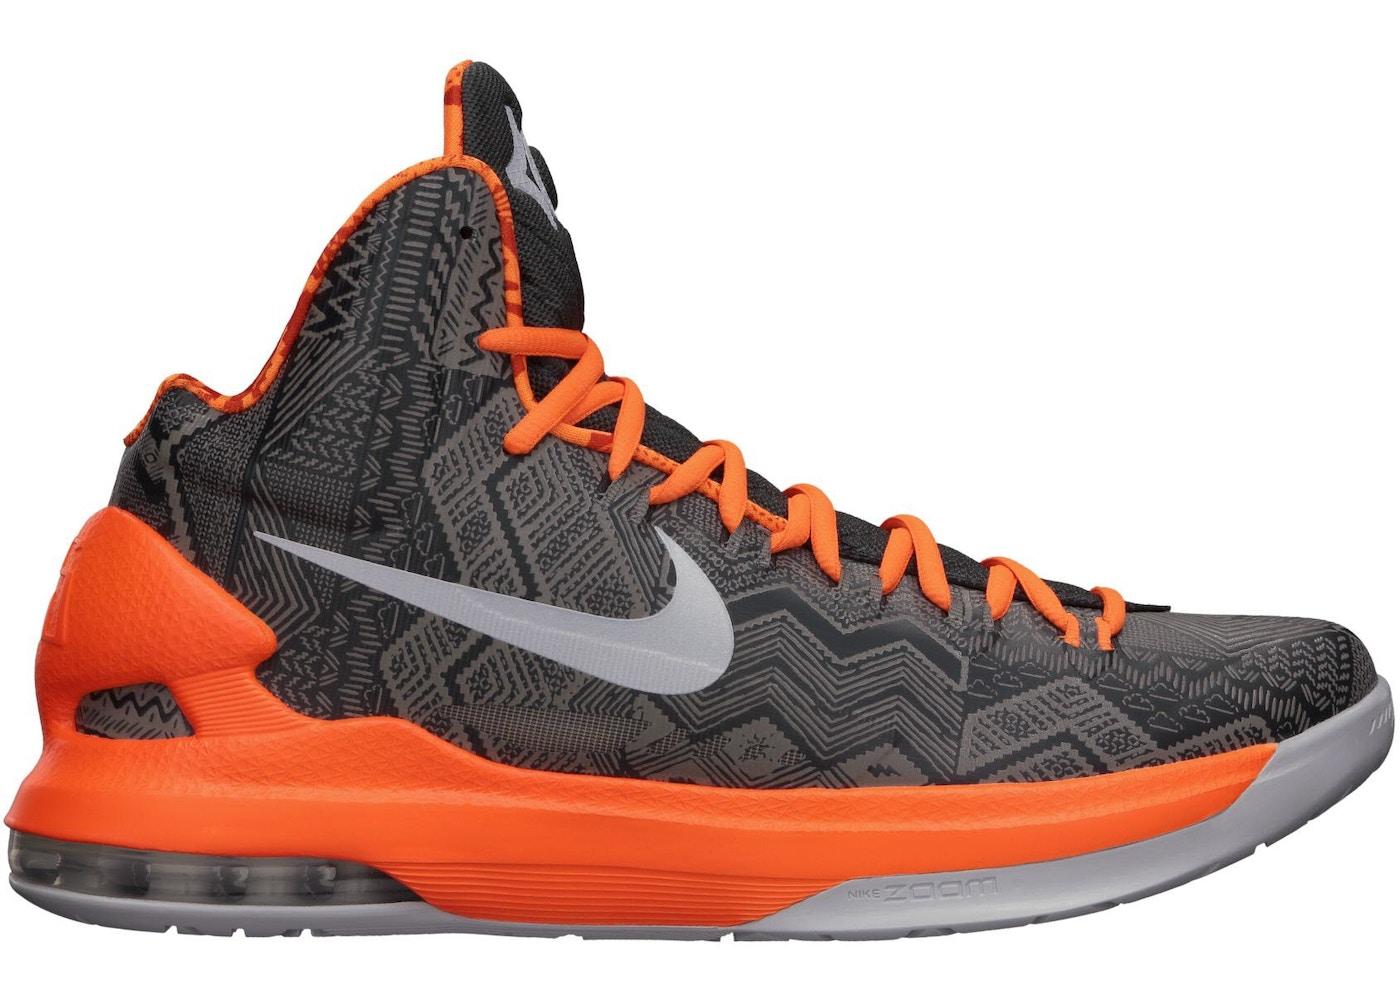 Nike KD 5 Black History Month - 583107-001 Black History Month Kd